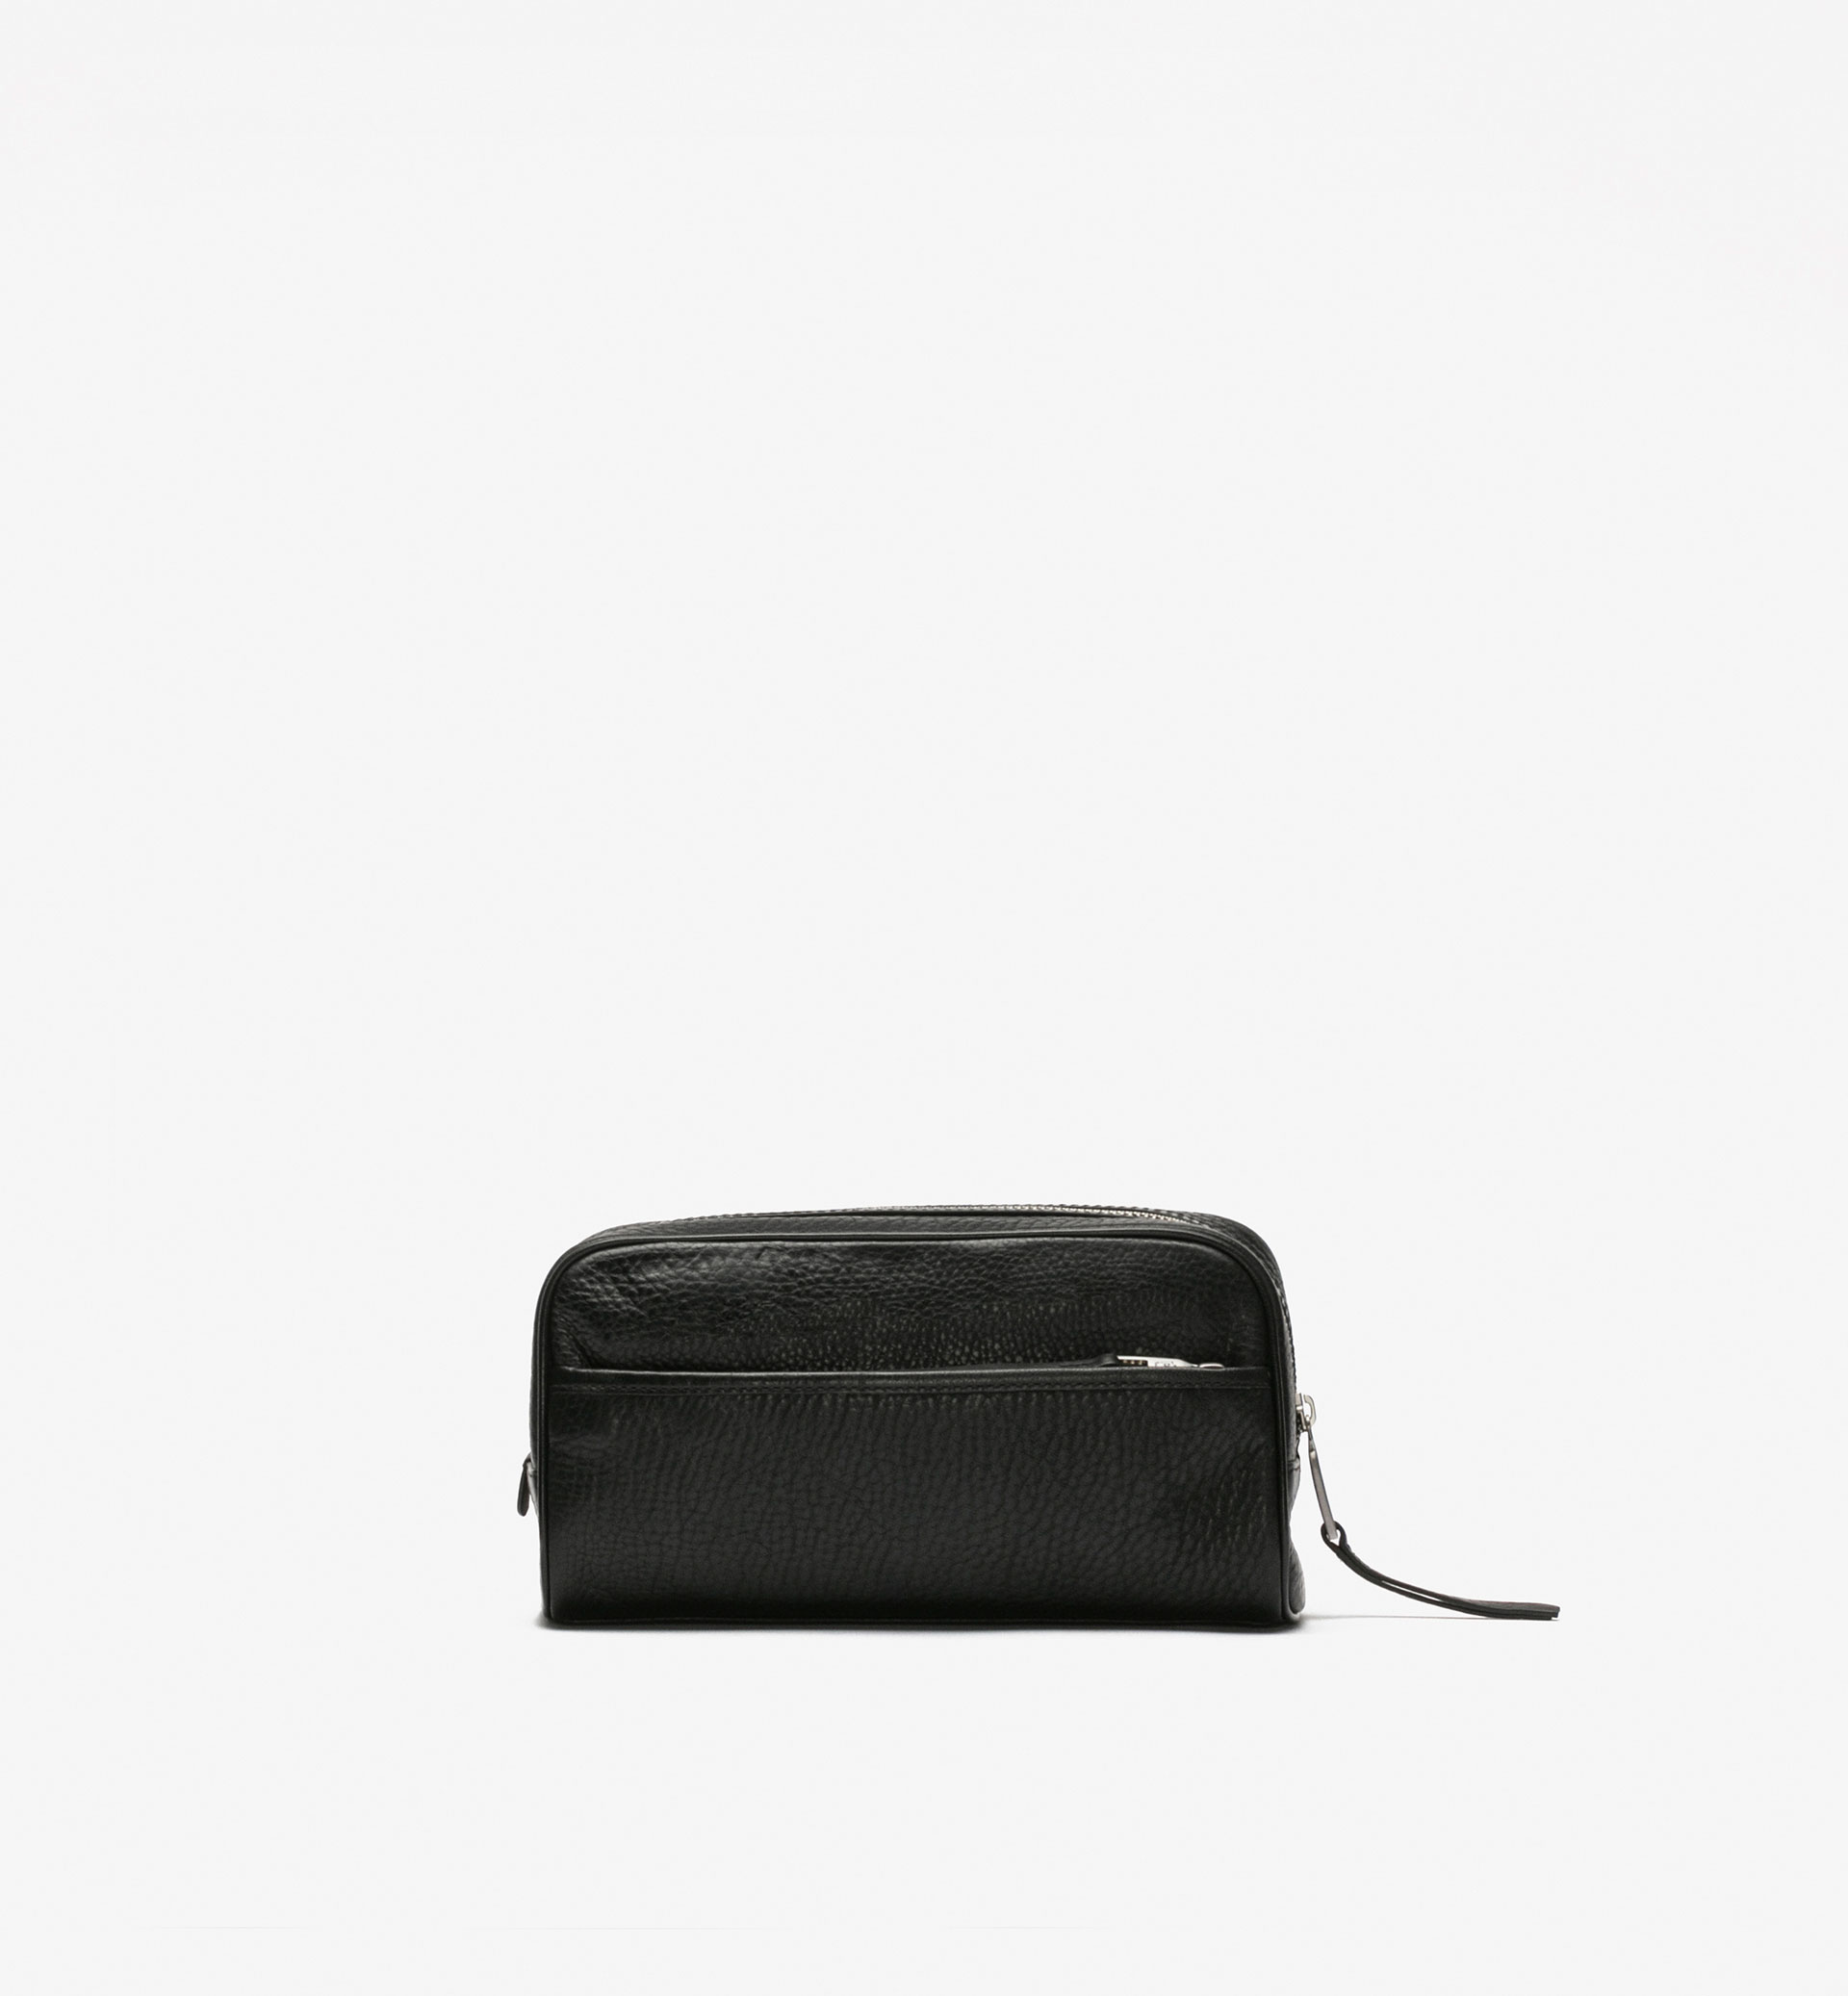 BLACK MONTANA TOILETRY BAG